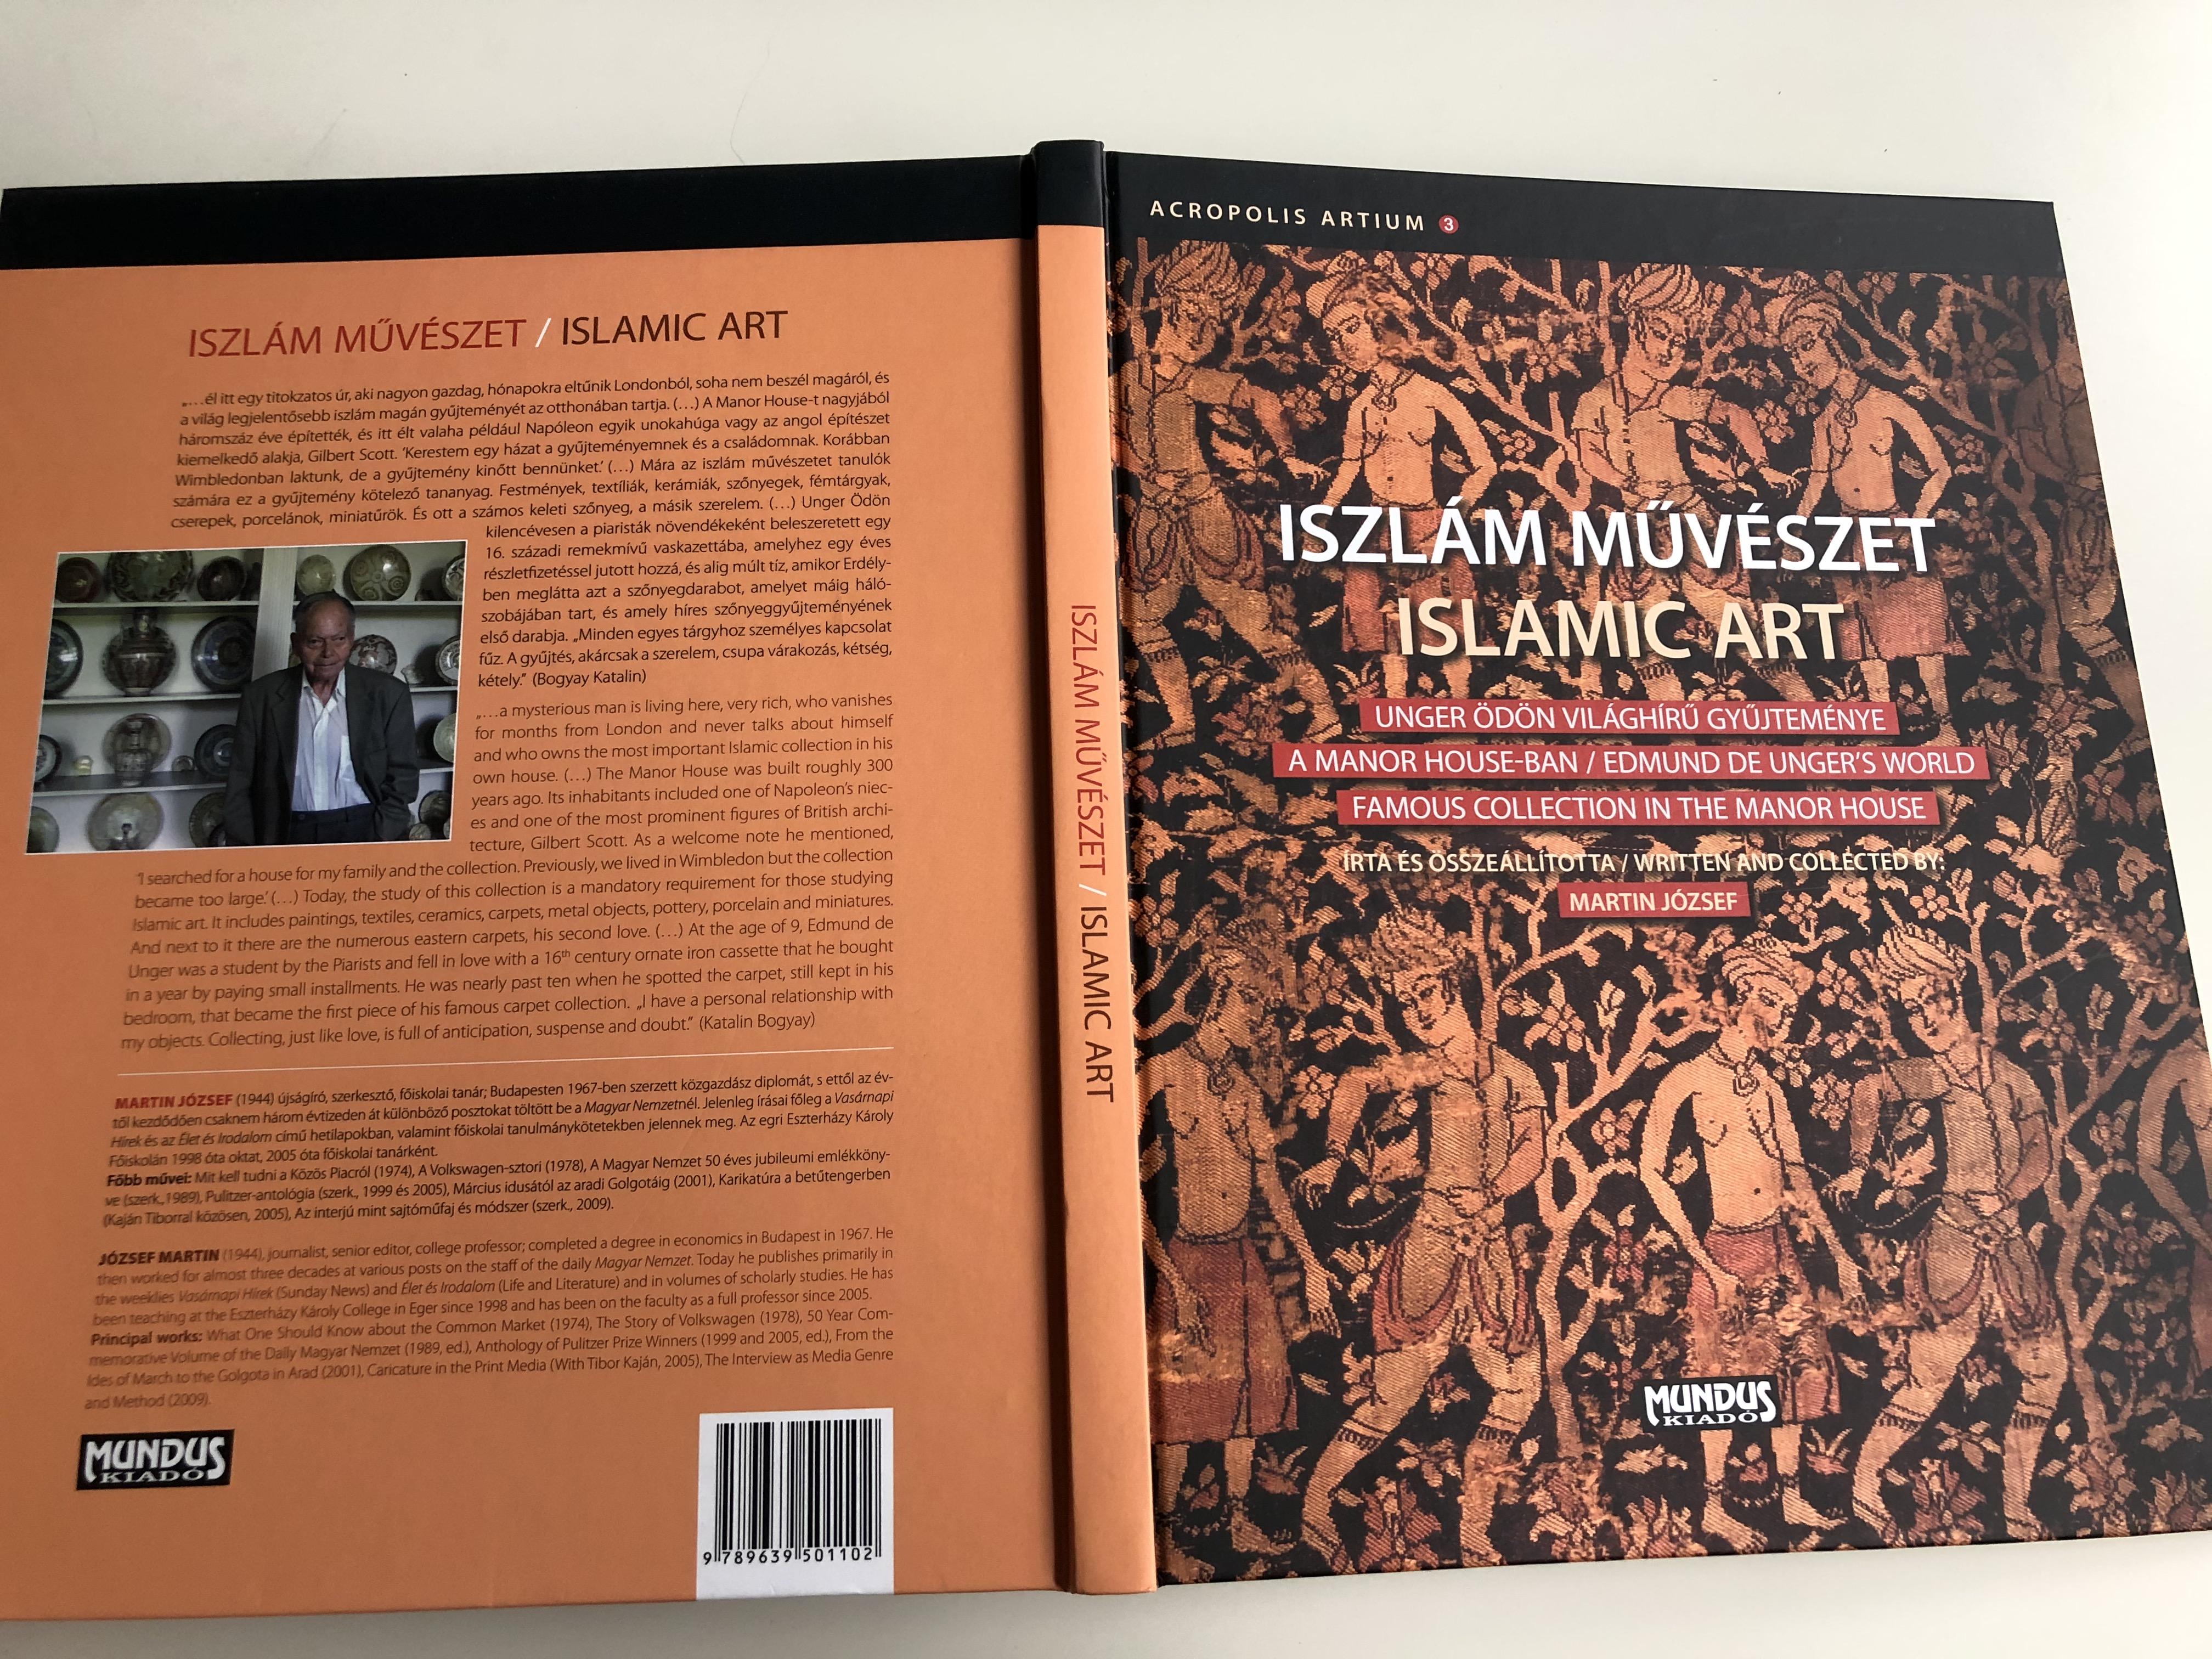 islamic-art-iszl-m-m-v-szet-by-martin-j-zsef-a-manor-house-ban-27.jpg